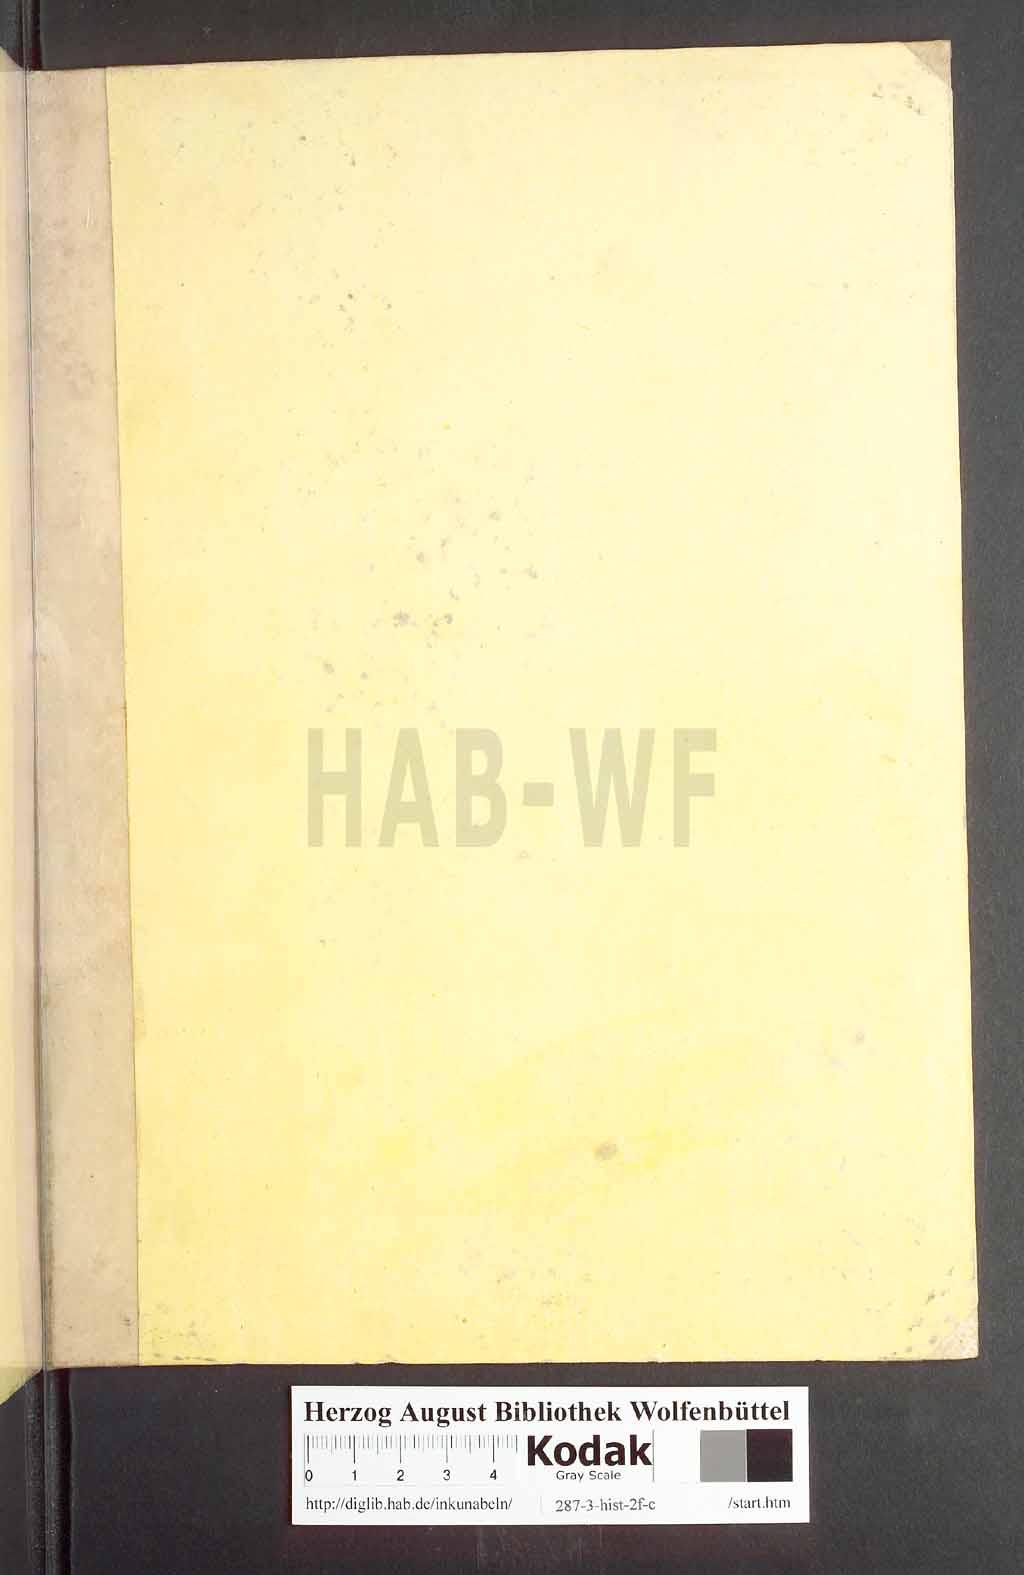 http://diglib.hab.de/inkunabeln/287-3-hist-2f-c/00001.jpg